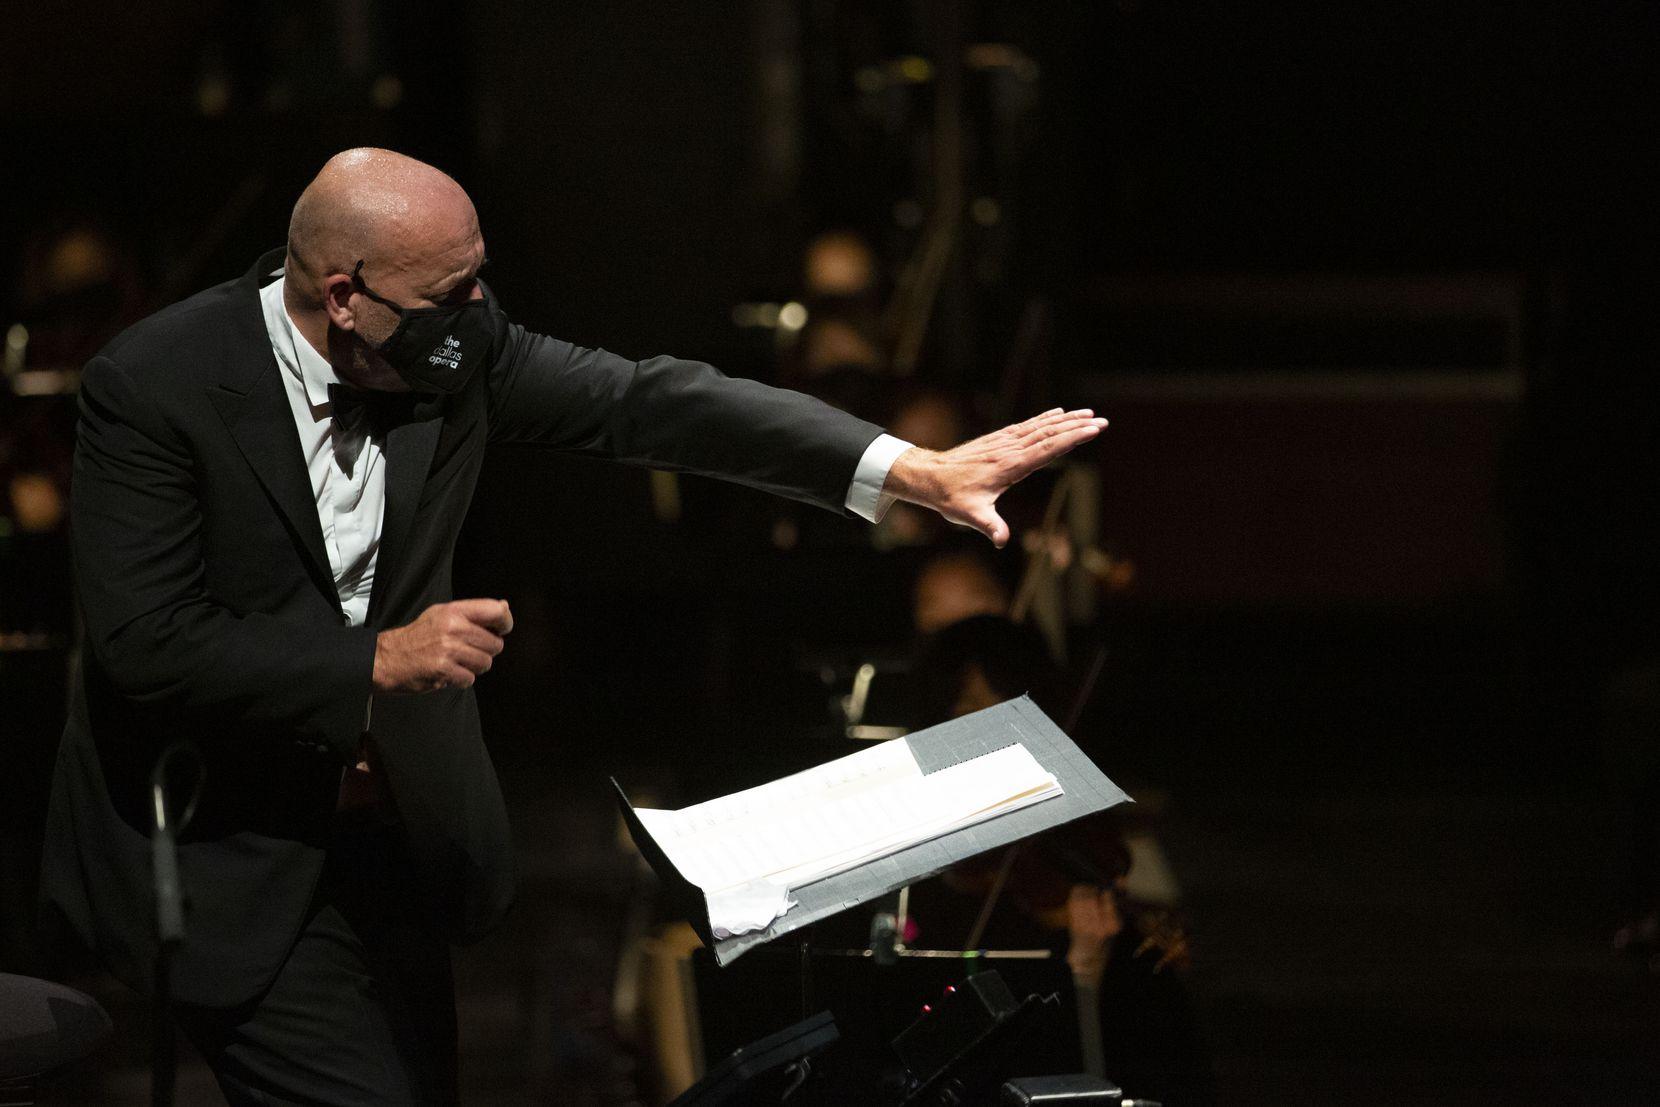 Emmanuel Villaume conducts the Dallas Opera Orchestra, with mezzo-soprano Joyce DiDonato, at the Winspear Opera House in Dallas, Texas on Monday, May 10, 2021.